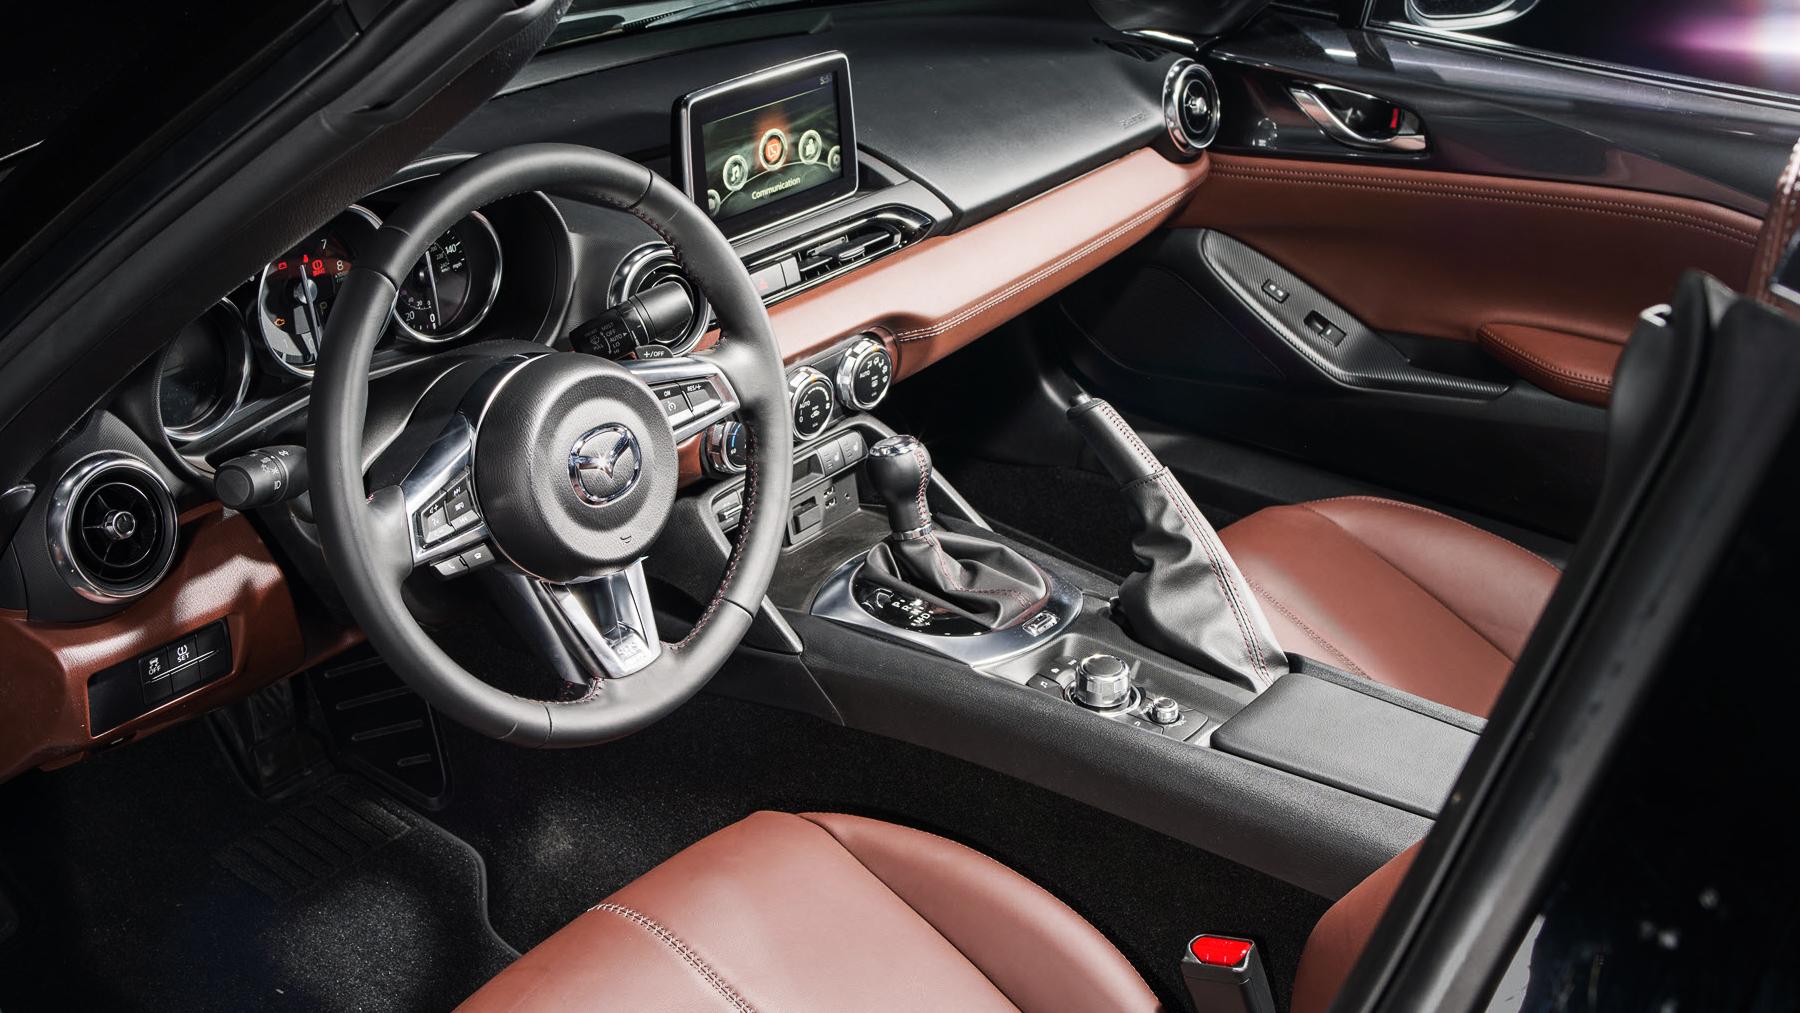 New Mazda MX-5 Miata Interior main image